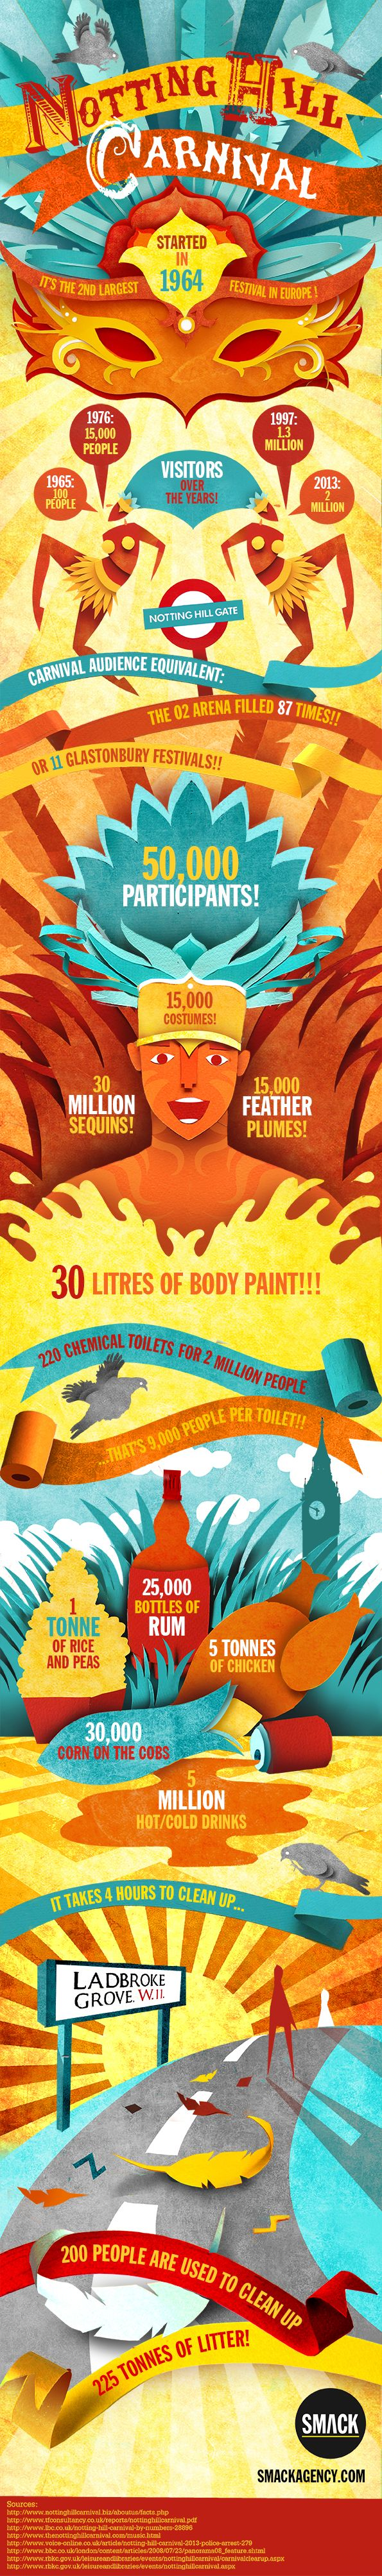 Nottinghill Carnival Infographic  #infographic #illustration #design…